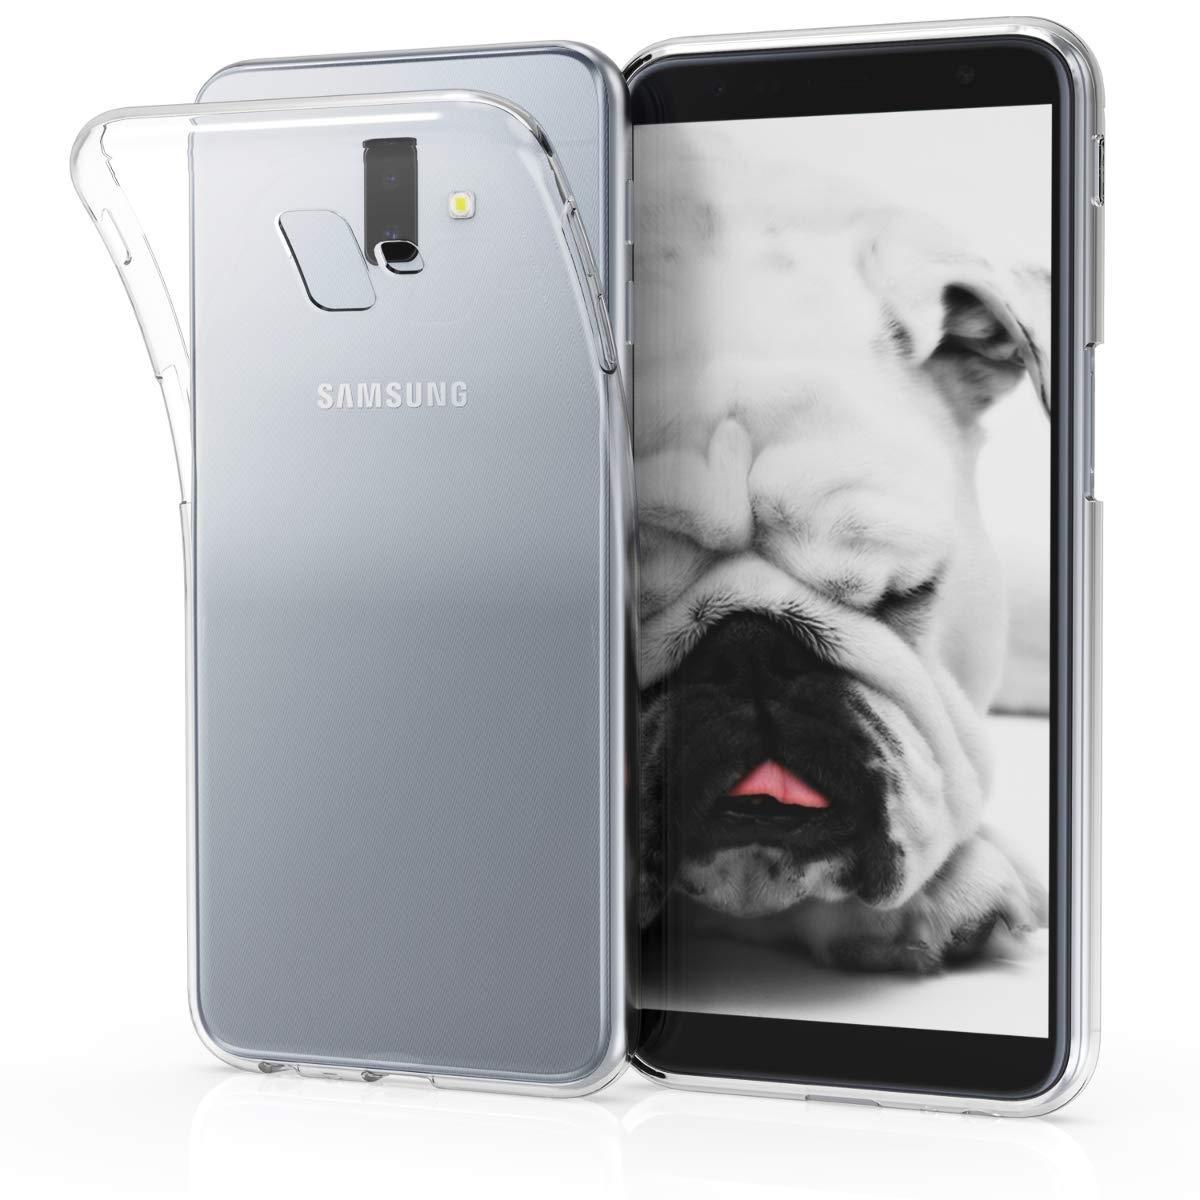 KW Θήκη Σιλικόνης Samsung Galaxy J6 Plus 2018 - Transparent (46440.03)